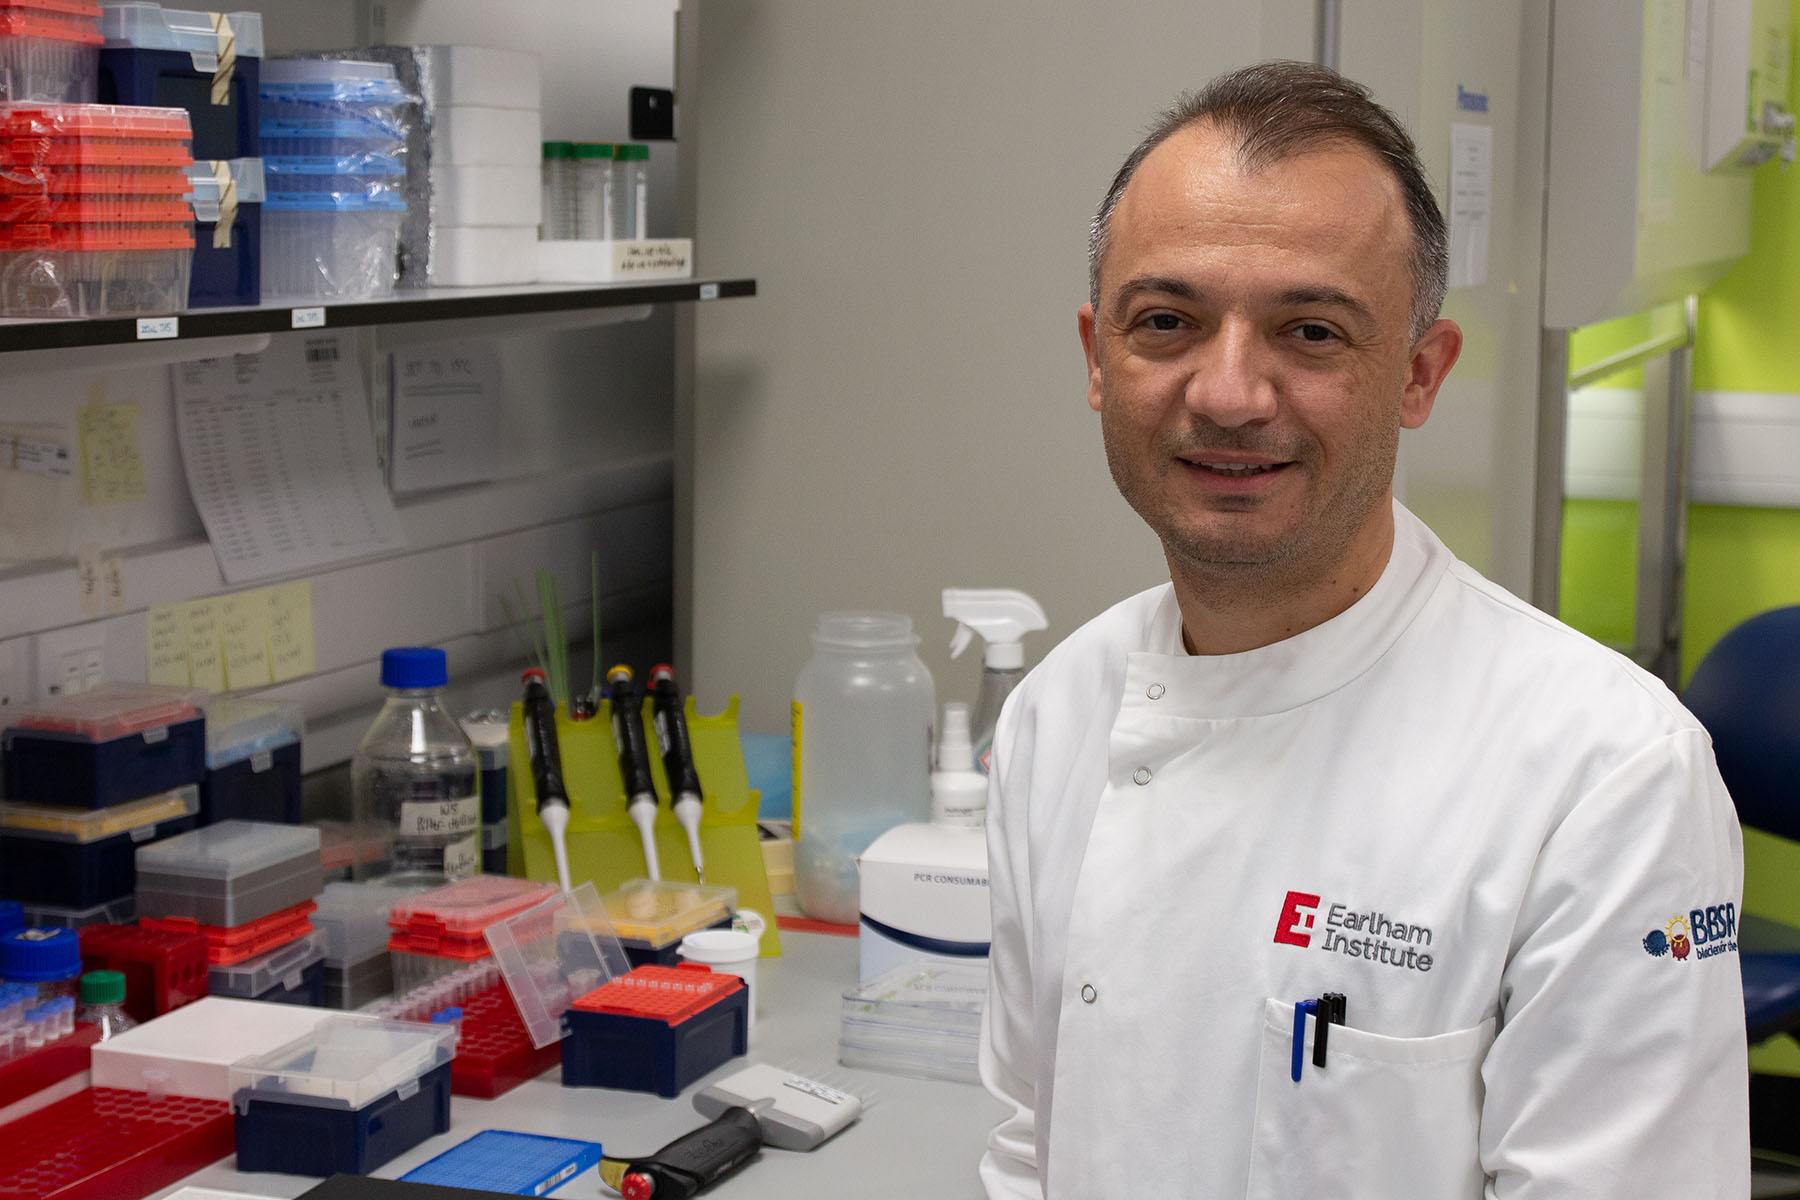 Dr Mehmet Tufan Oz at Earlham Institute